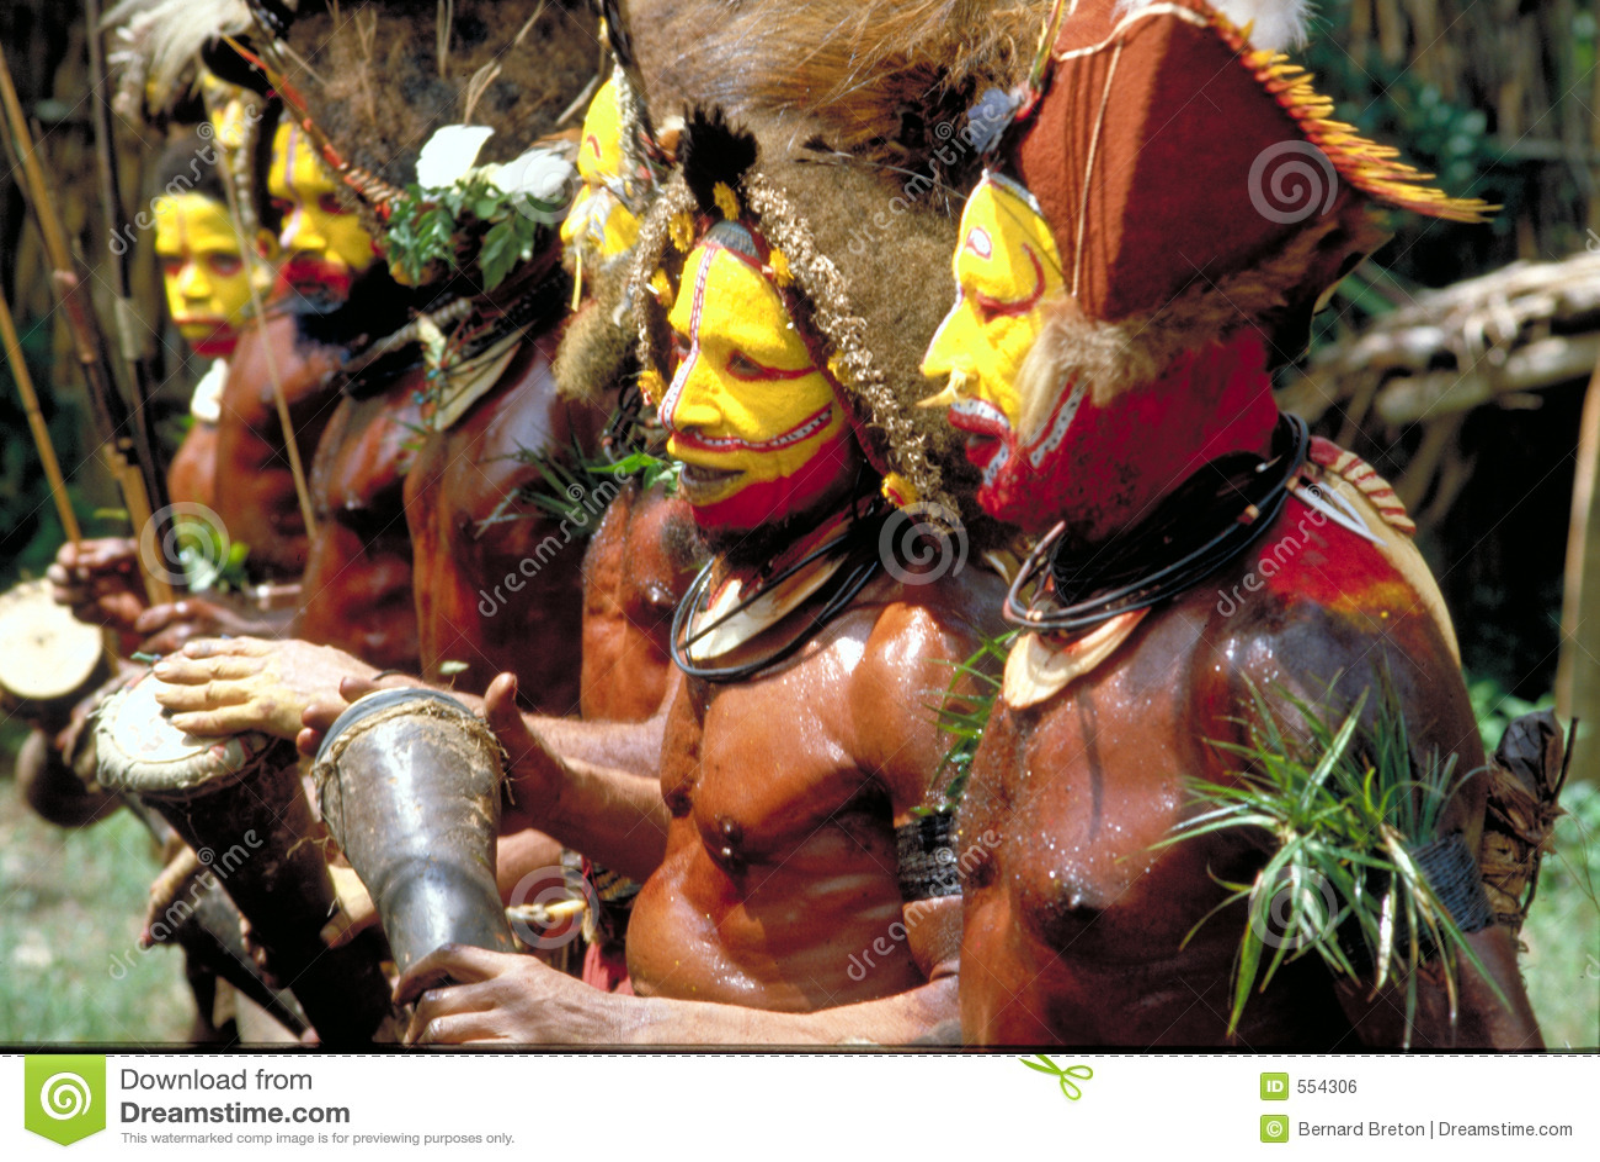 Papua Nueva Guinea, danza